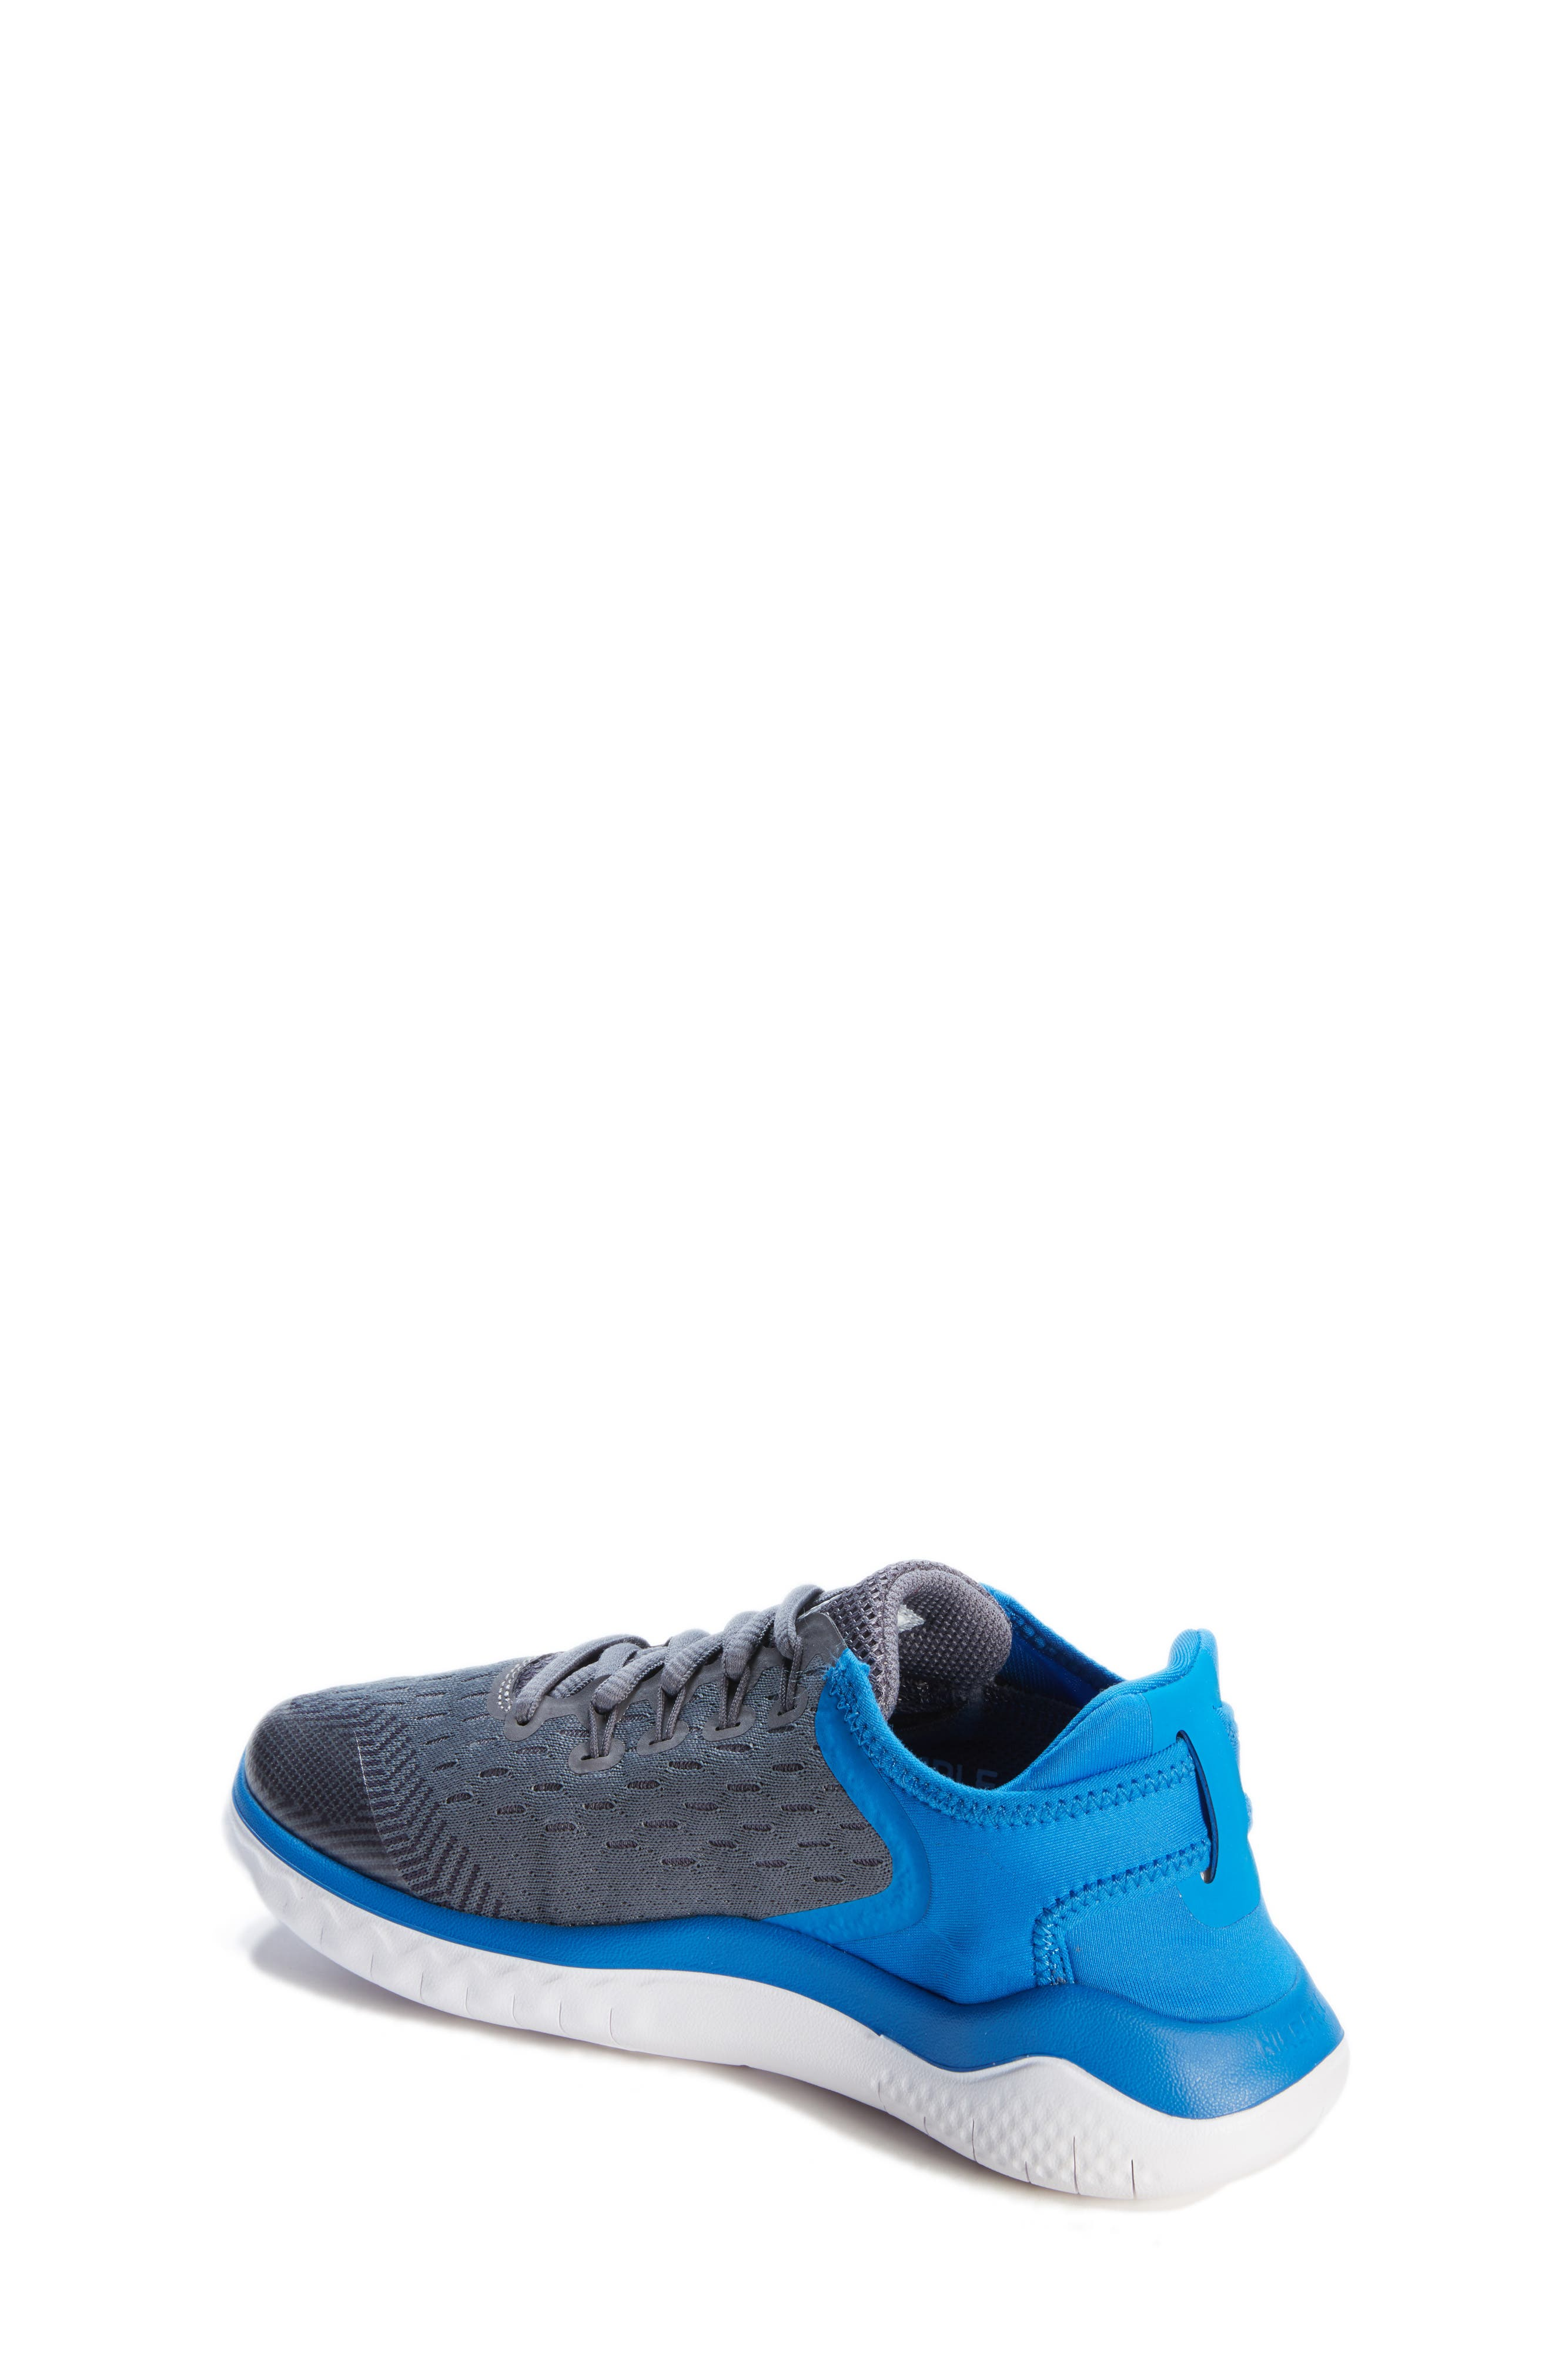 Free RN 2018 Running Shoe,                             Alternate thumbnail 2, color,                             GREY/WHITE/BLUE